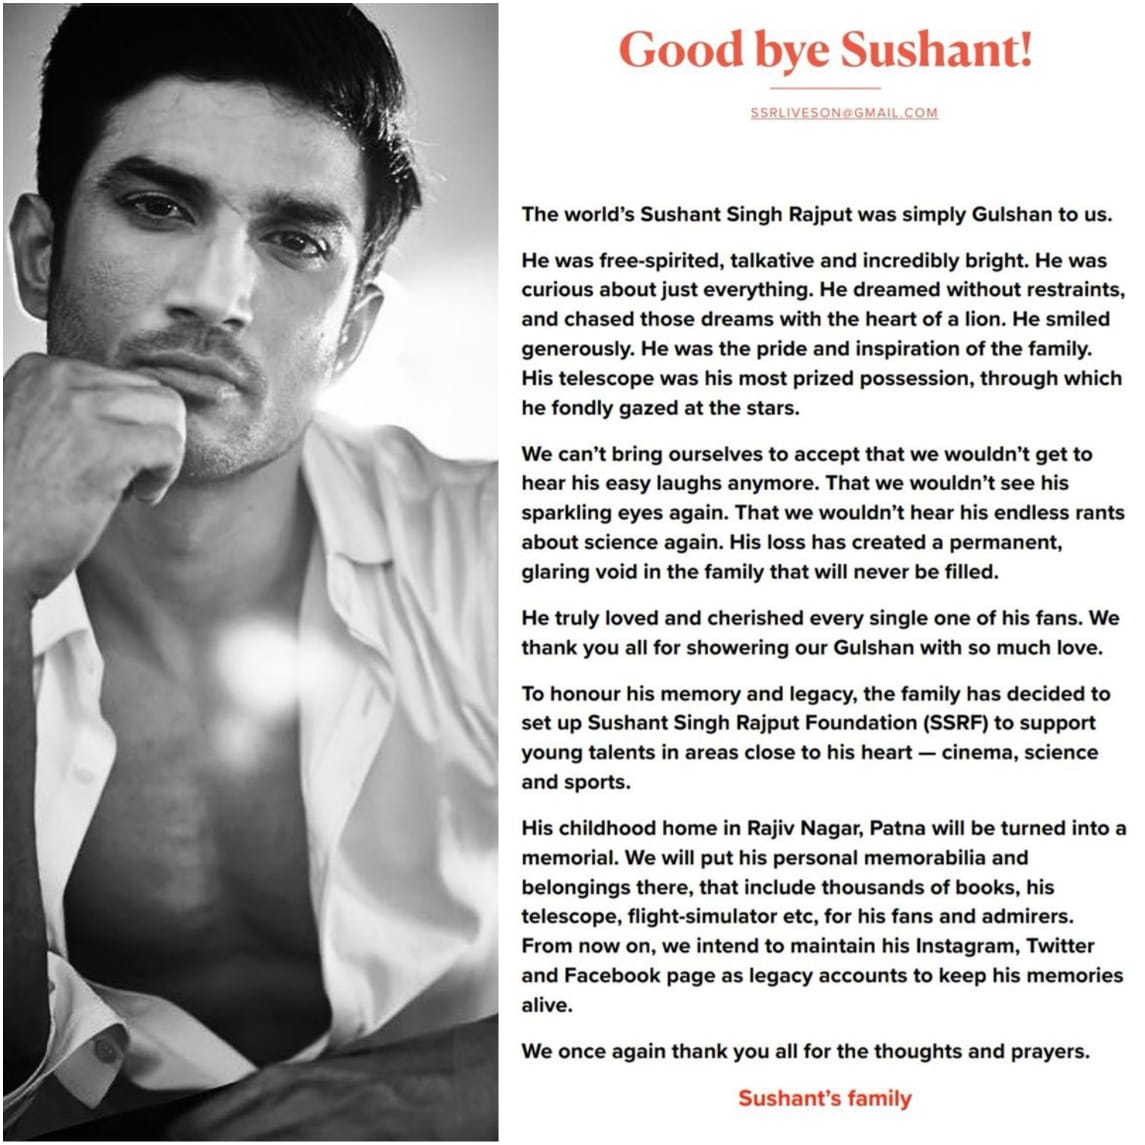 Shushant's family to set up Sushant Singh Rajput Foundation (SSRF)